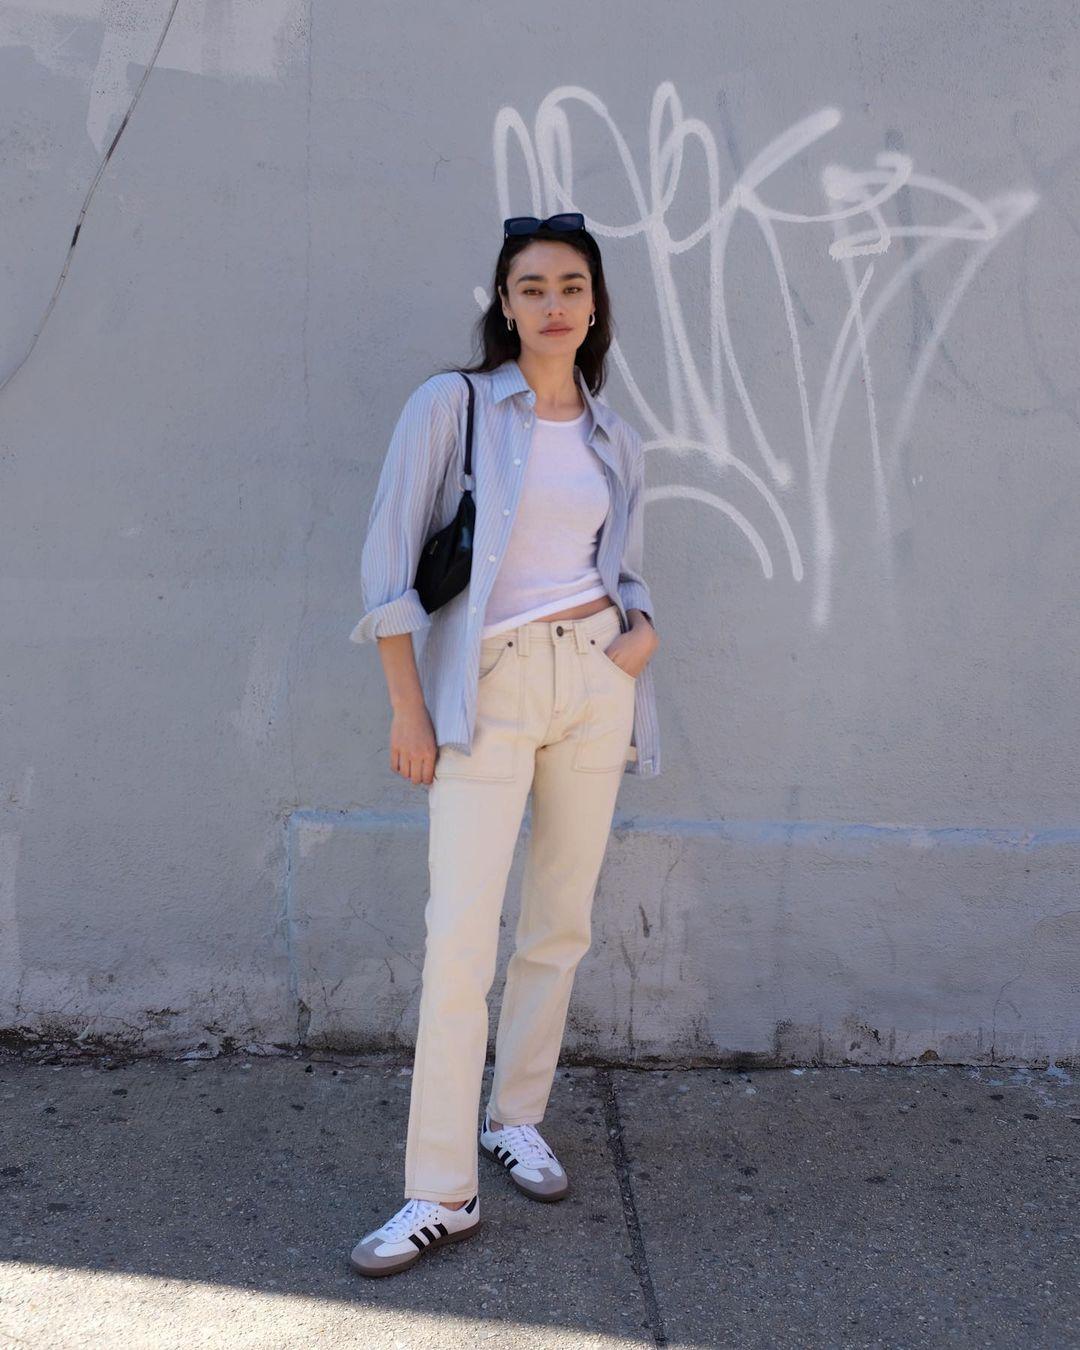 Kaitlyn-Fitzpatrick-Wallpapers-Insta-Fit-Bio-1